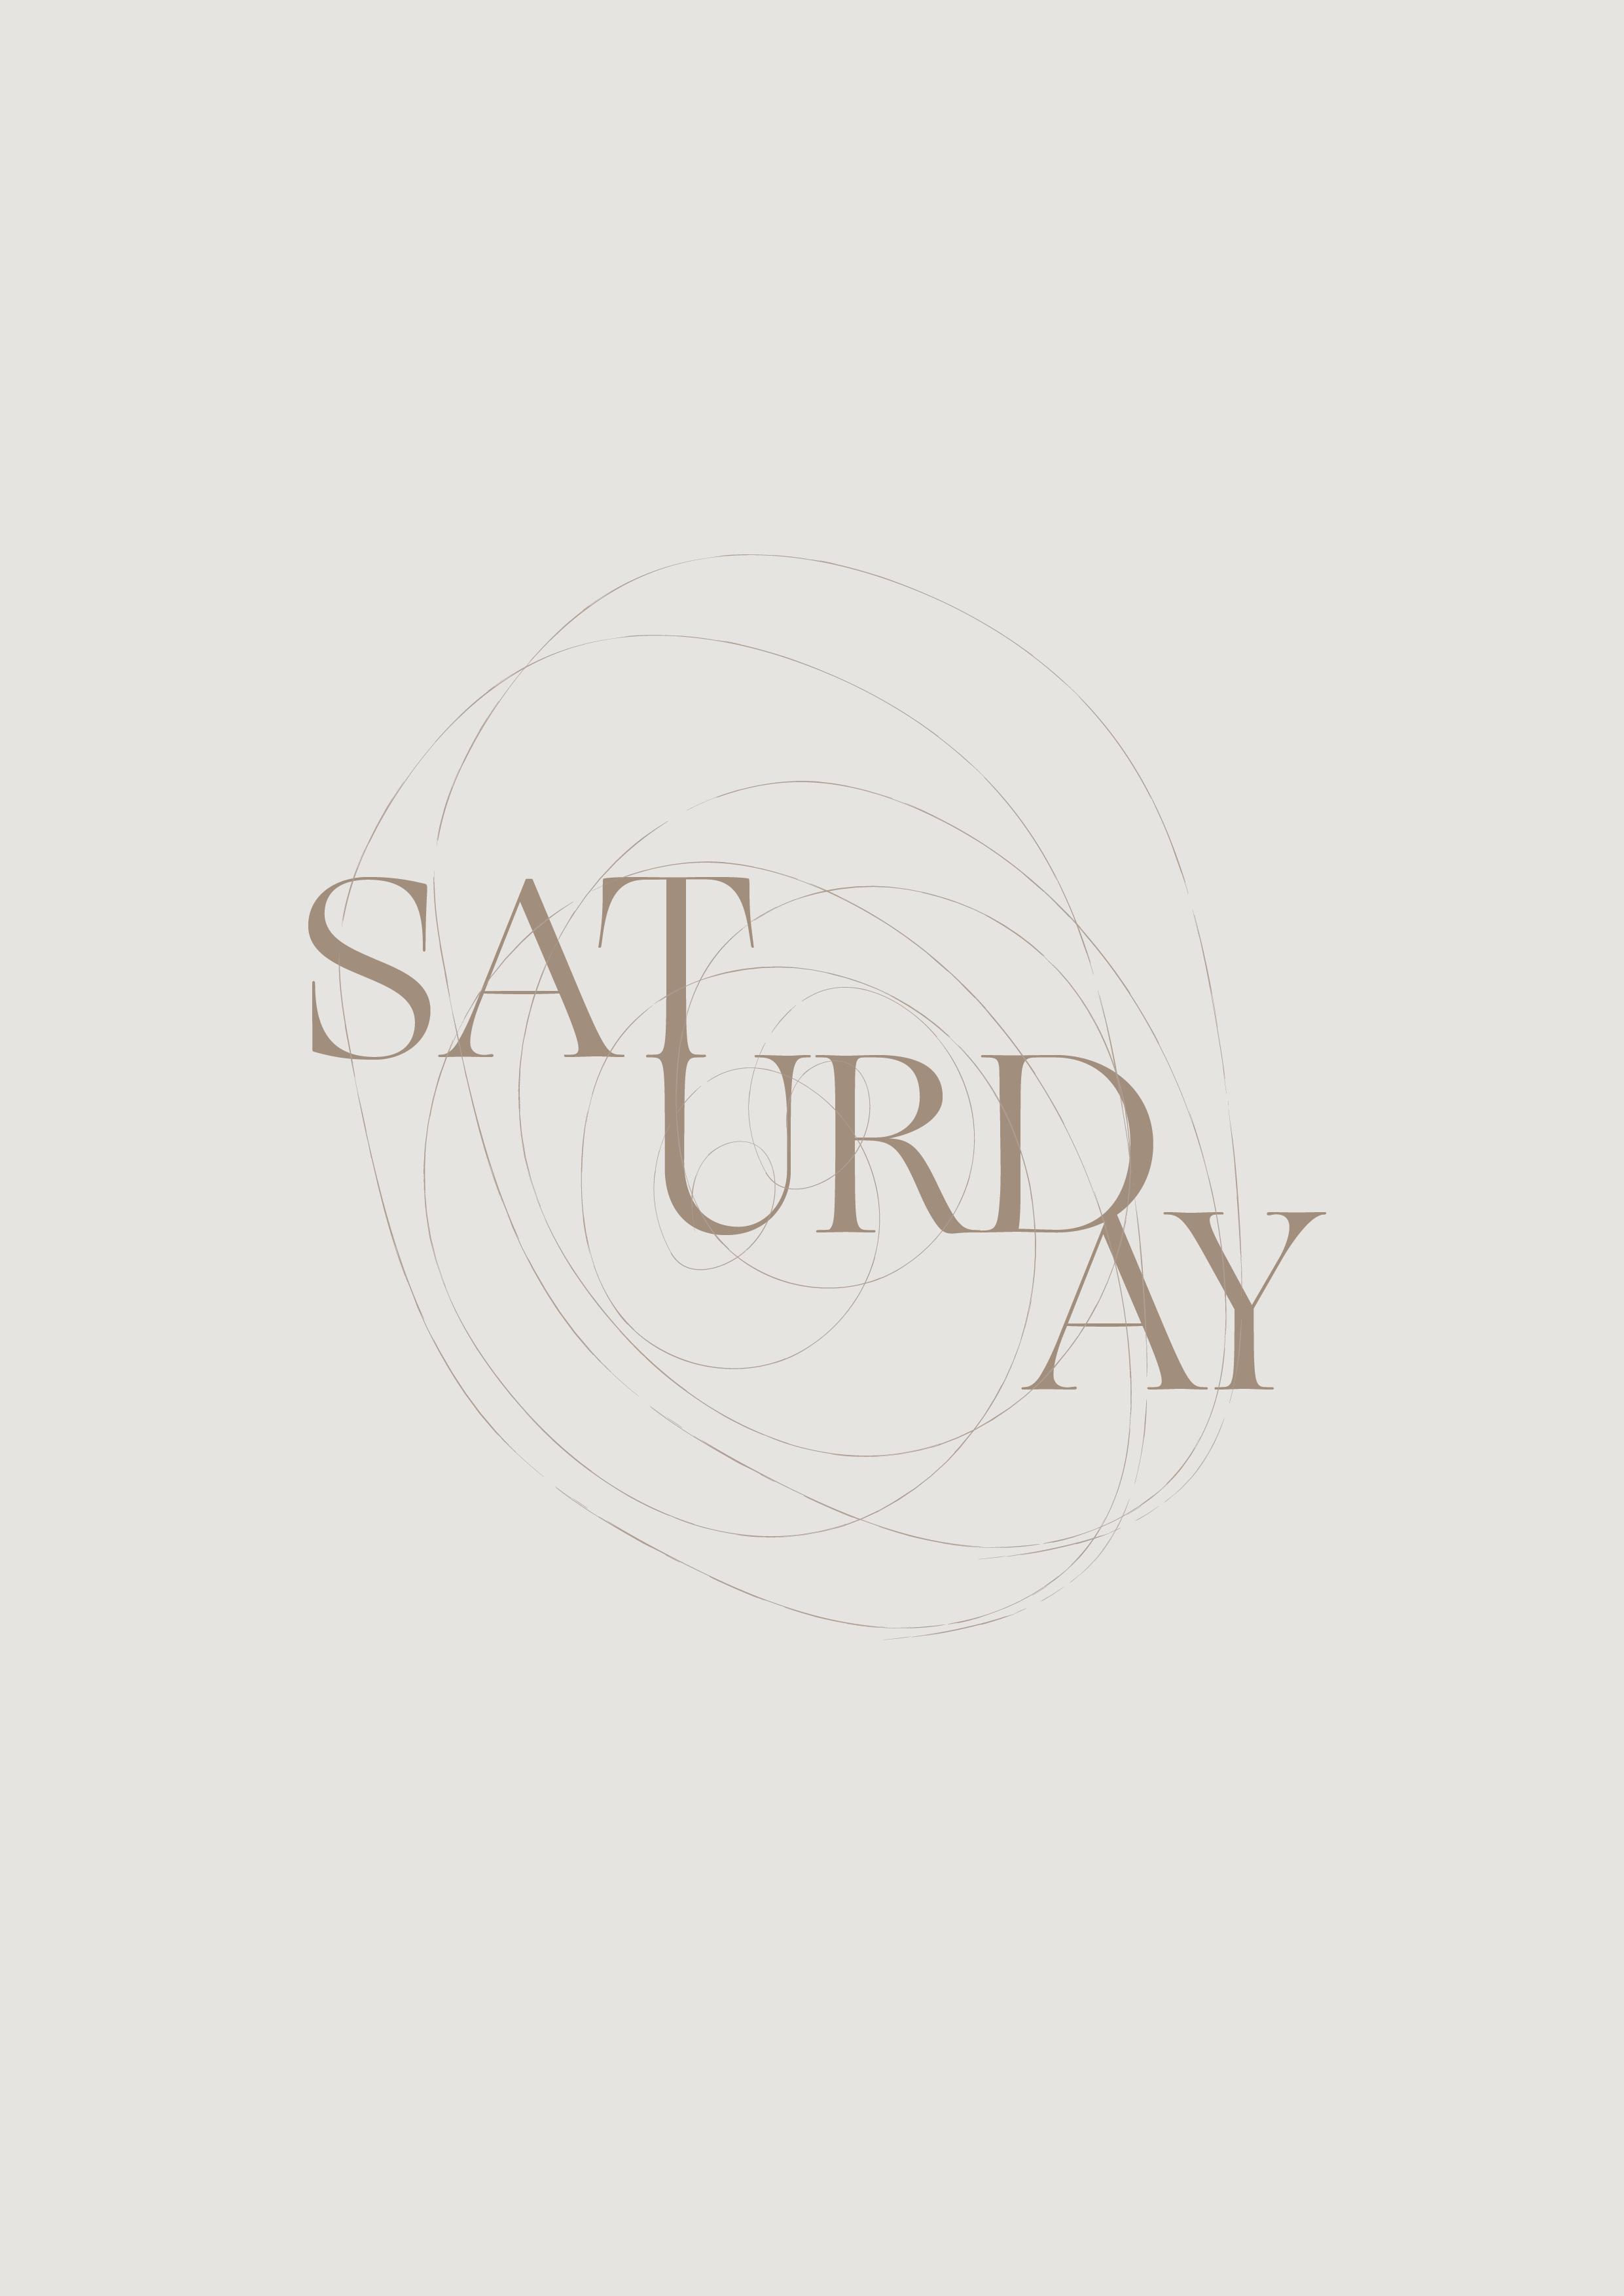 saturday branding // phylleli design studio & self-care blog